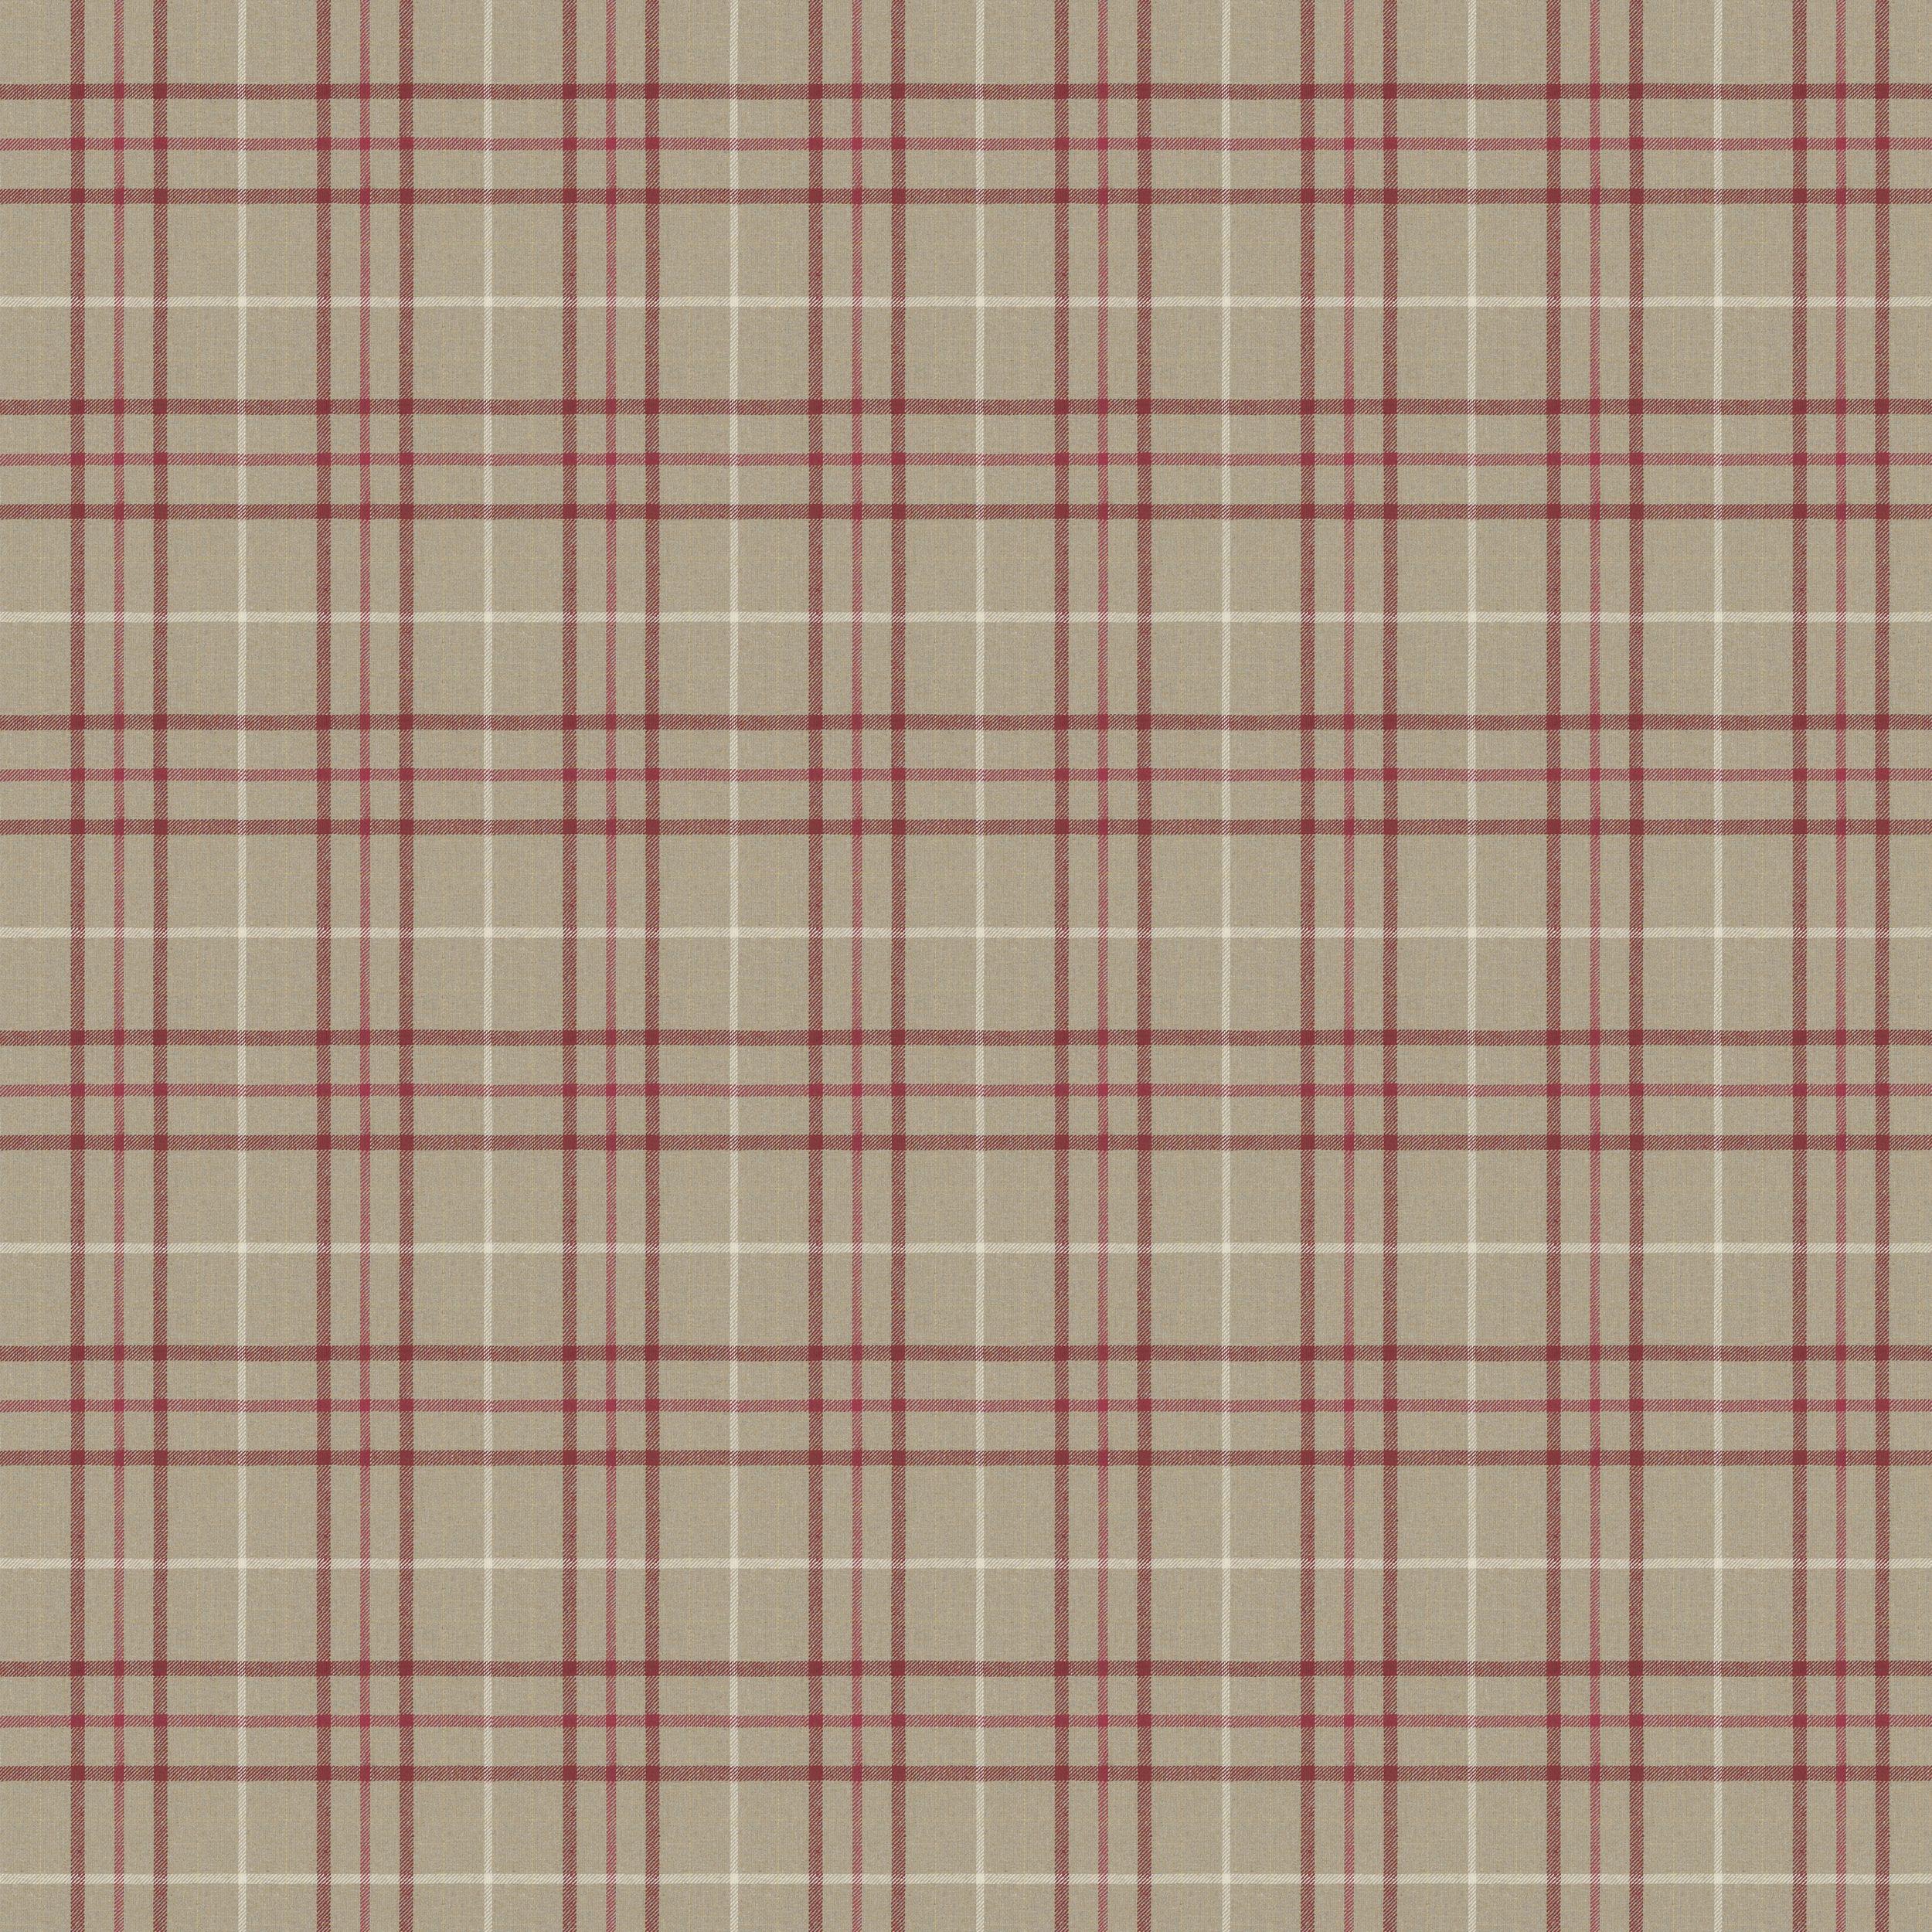 Laura Ashley Keynes Cranberry Check Linen Mix Upholstery